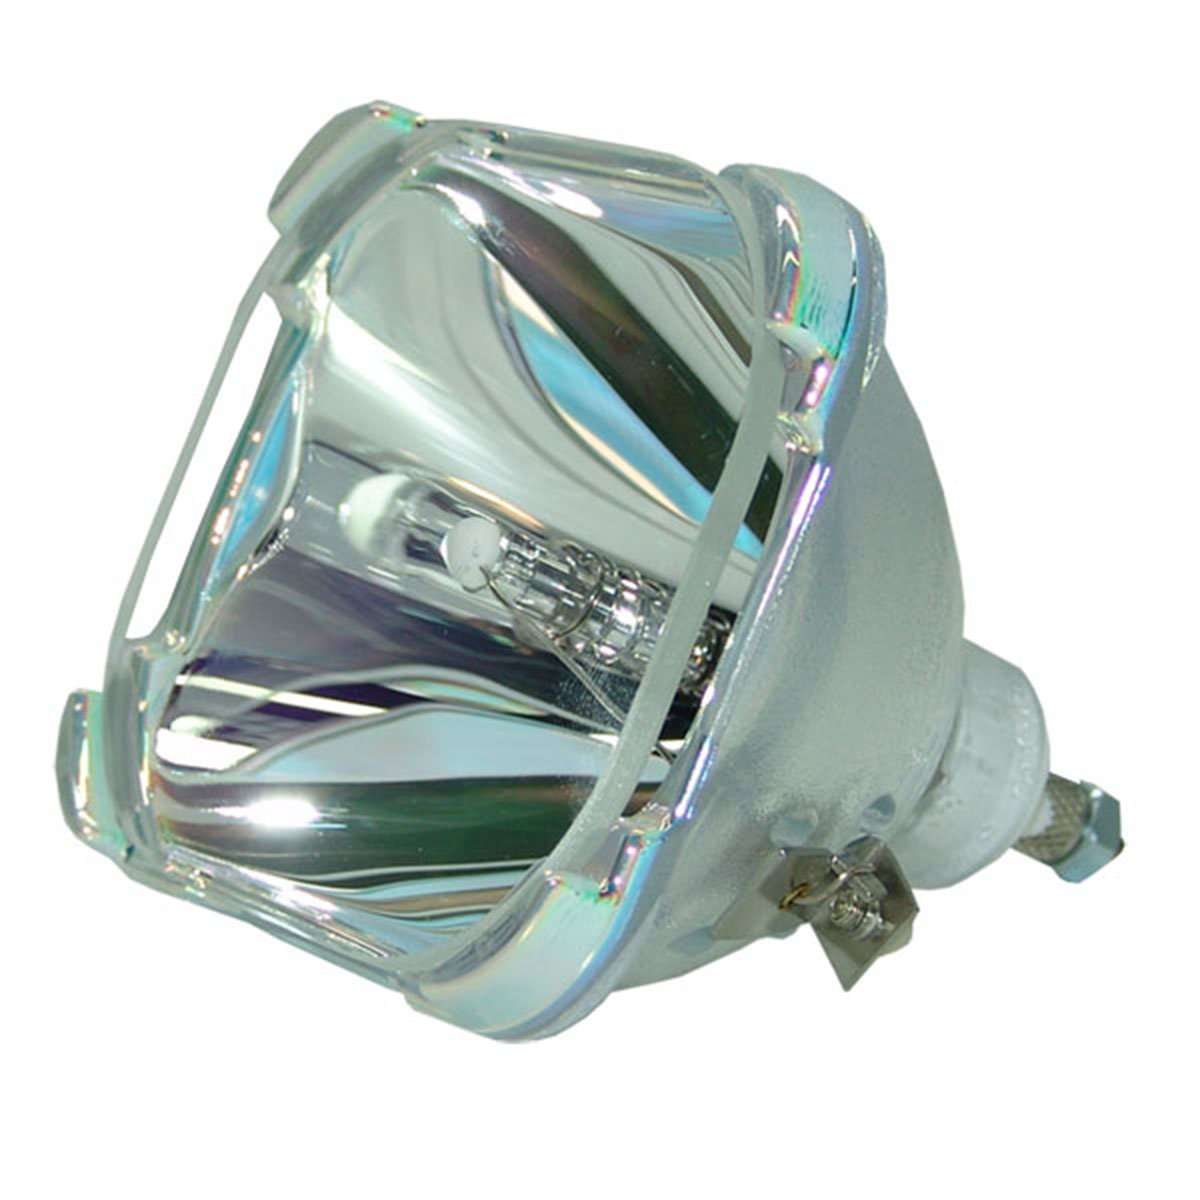 Lutema OEM プロジェクター交換用ランプ ハウジング/電球付き Ask Proxima Ultralight LX2用 Economy Economy Lamp Only B07KTKZH5S